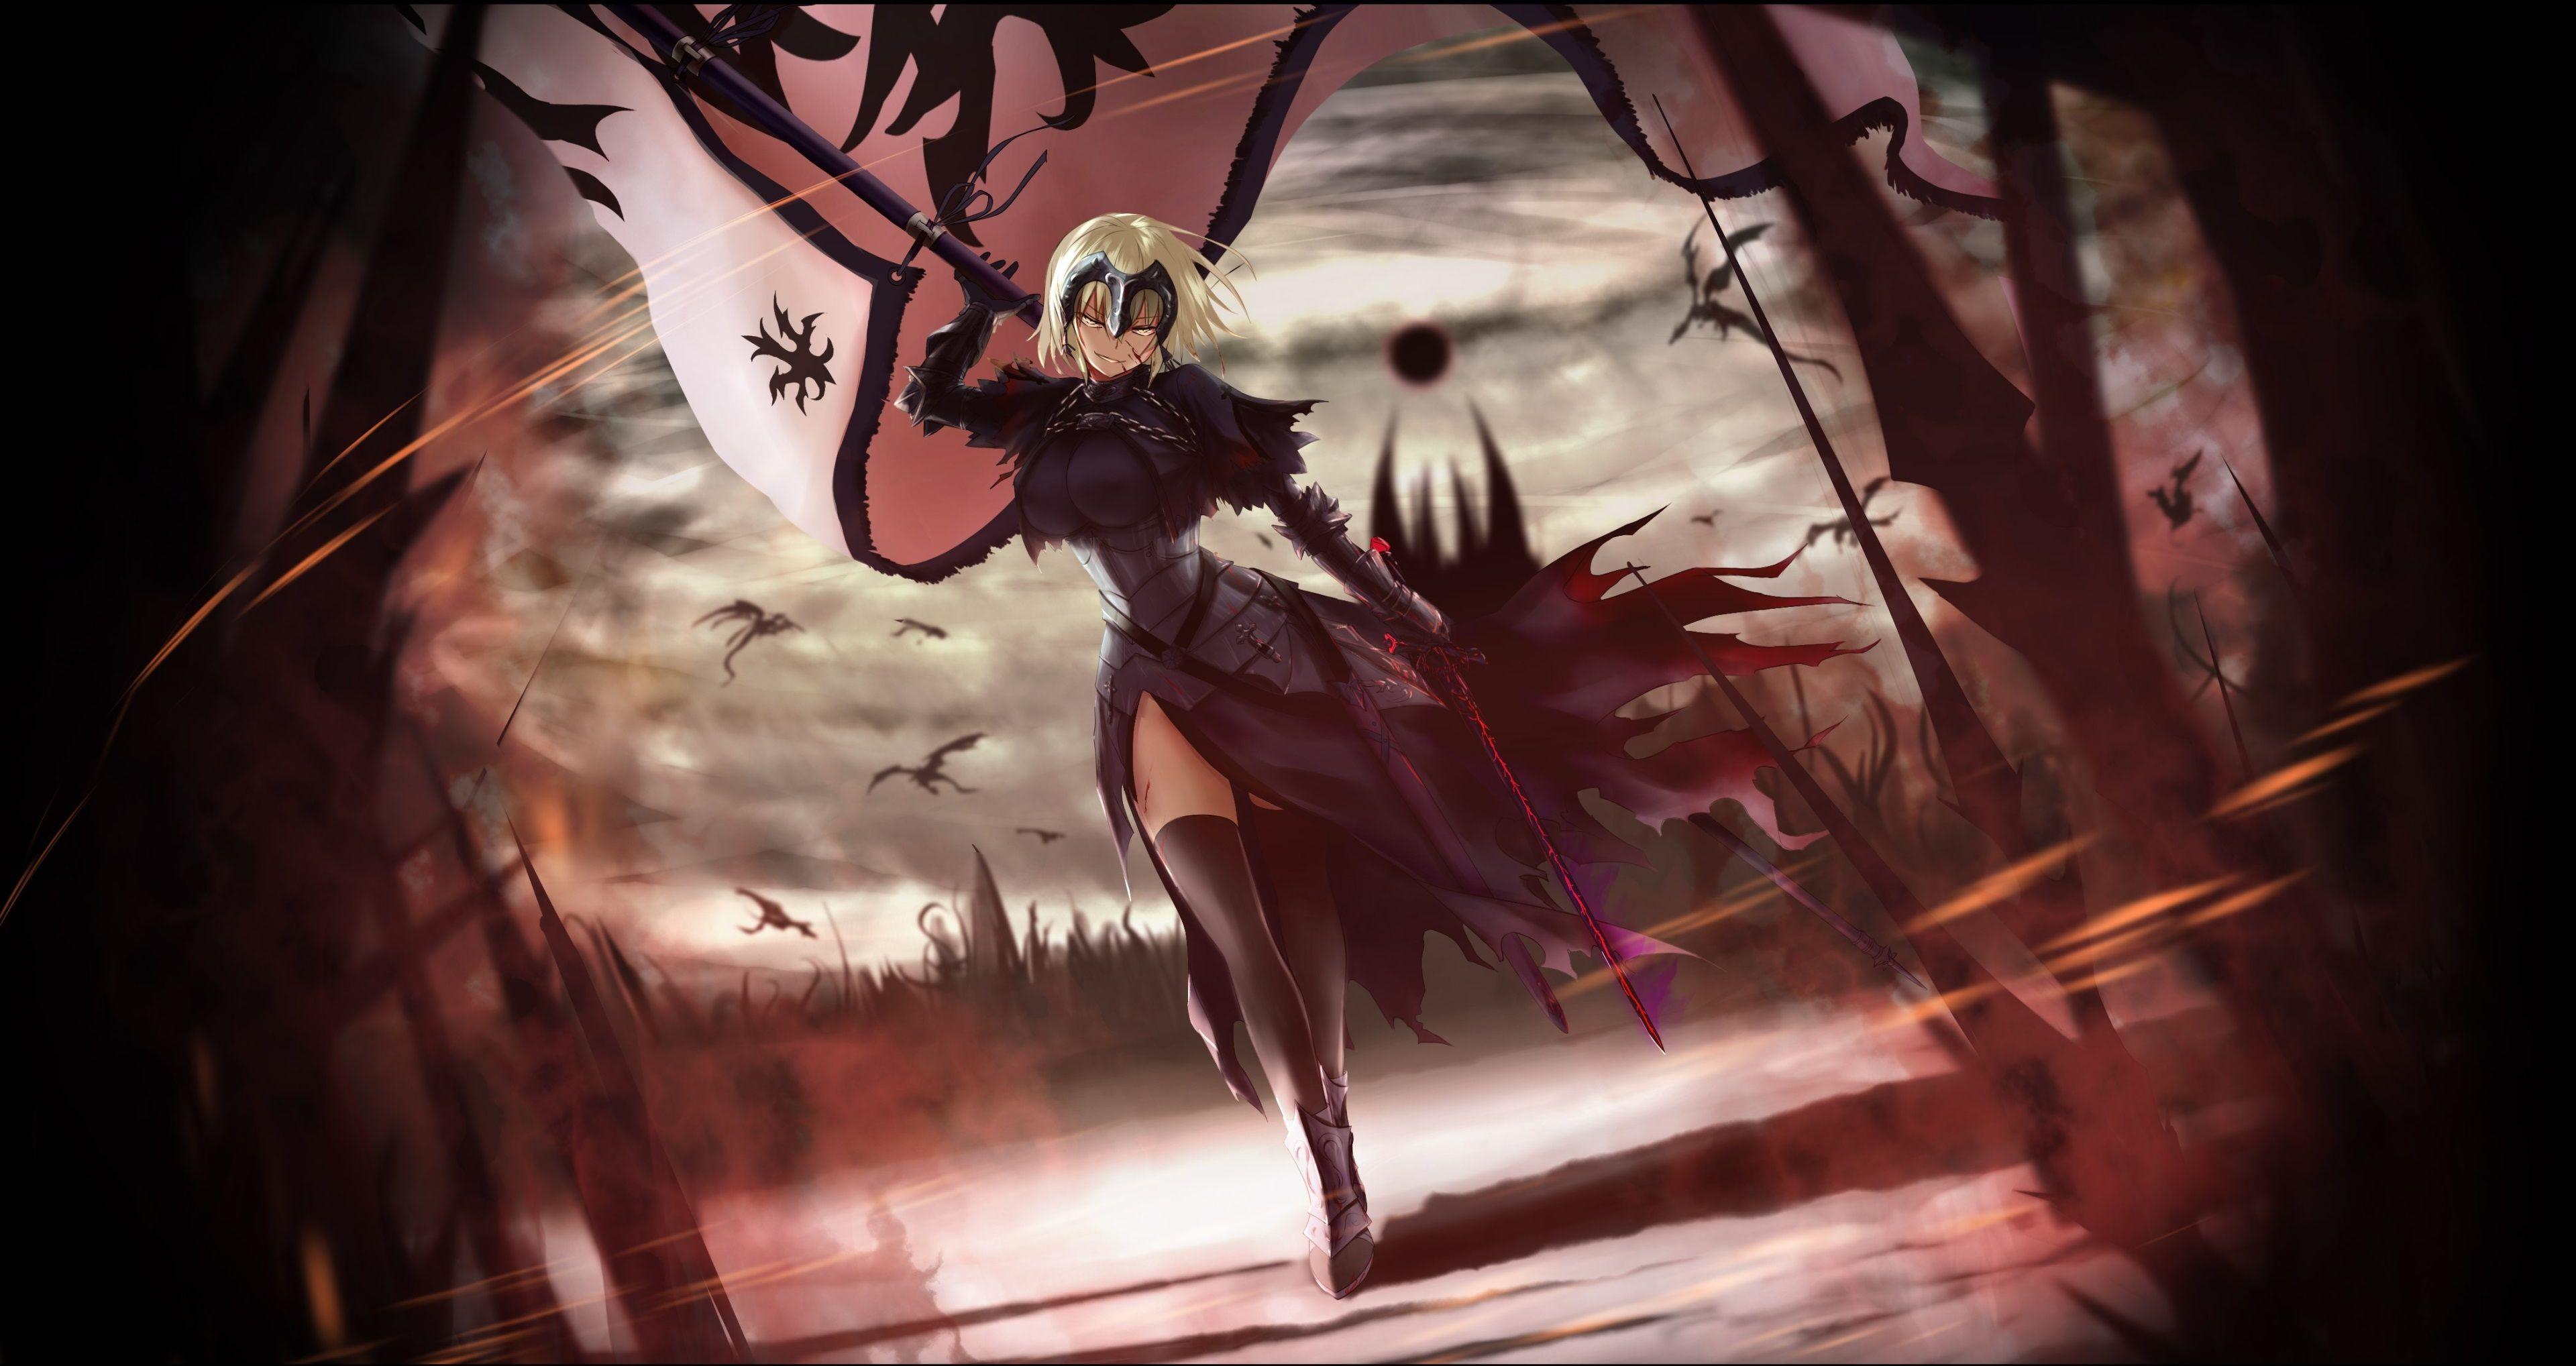 3840x37 Fate Grand Order 4k Popular Wallpaper Anime Fate Anime Art Beautiful